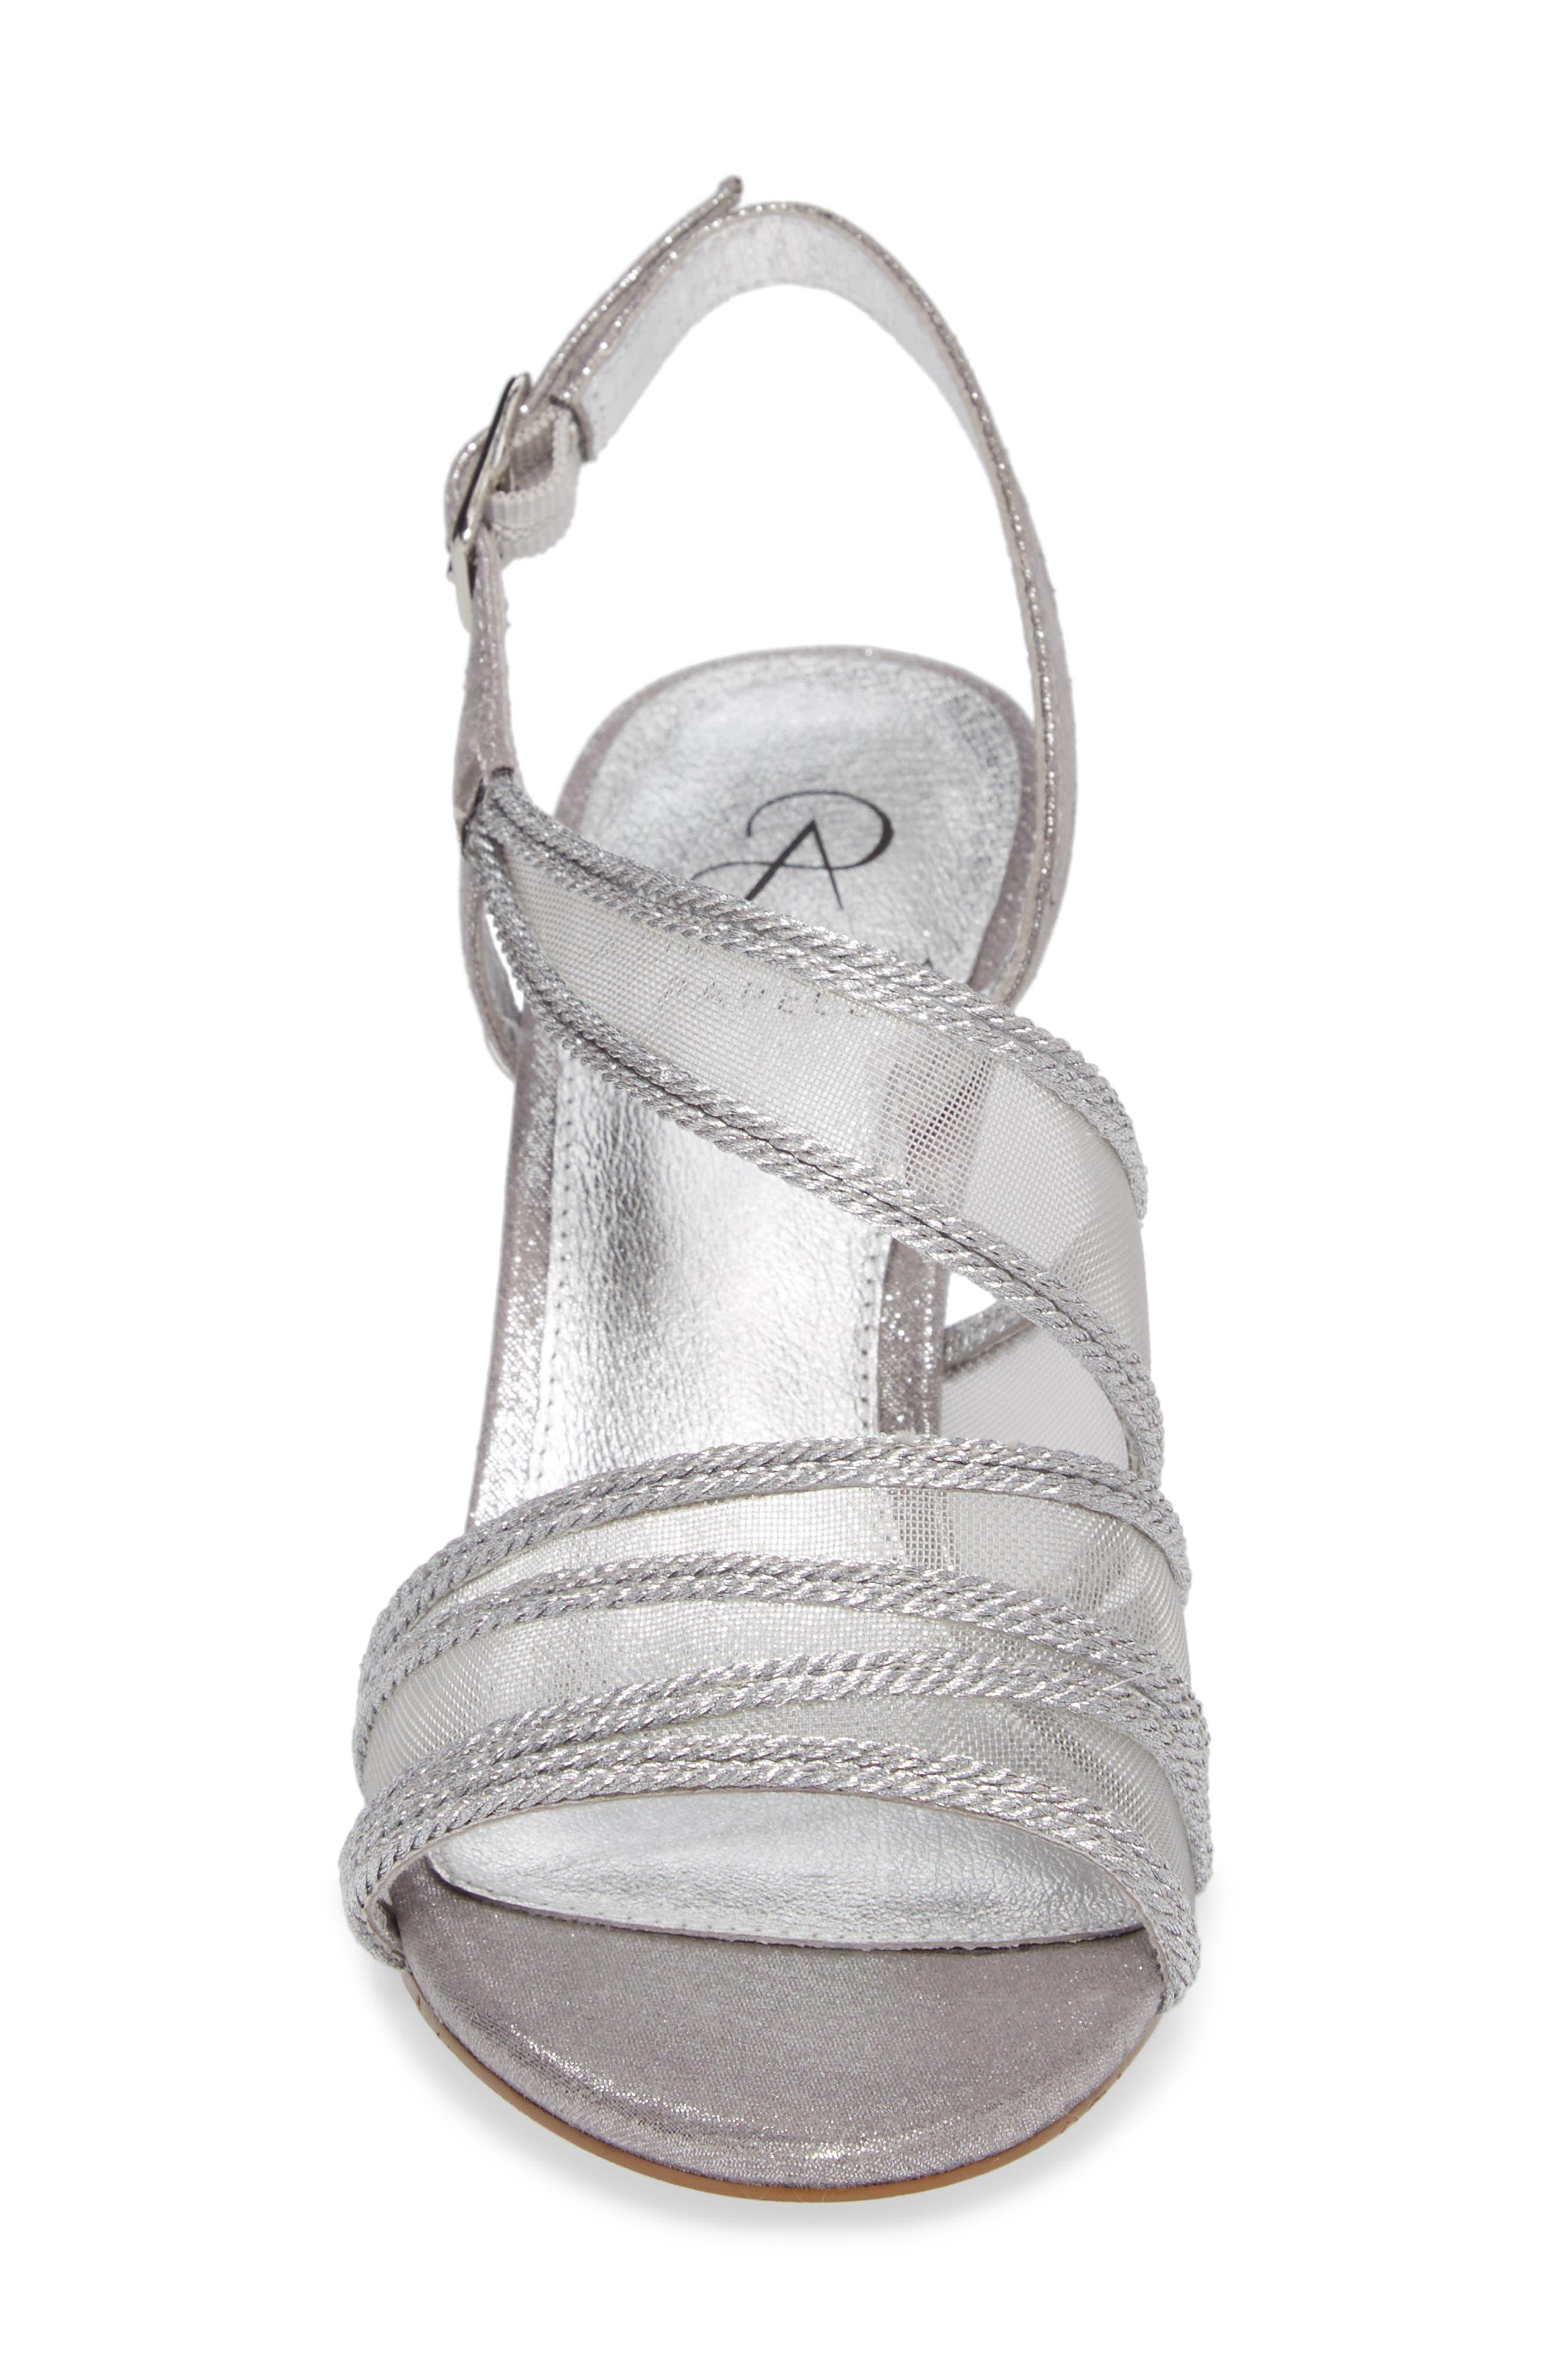 Adelphi Asymmetrical Mesh Sandal,                             Alternate thumbnail 13, color,